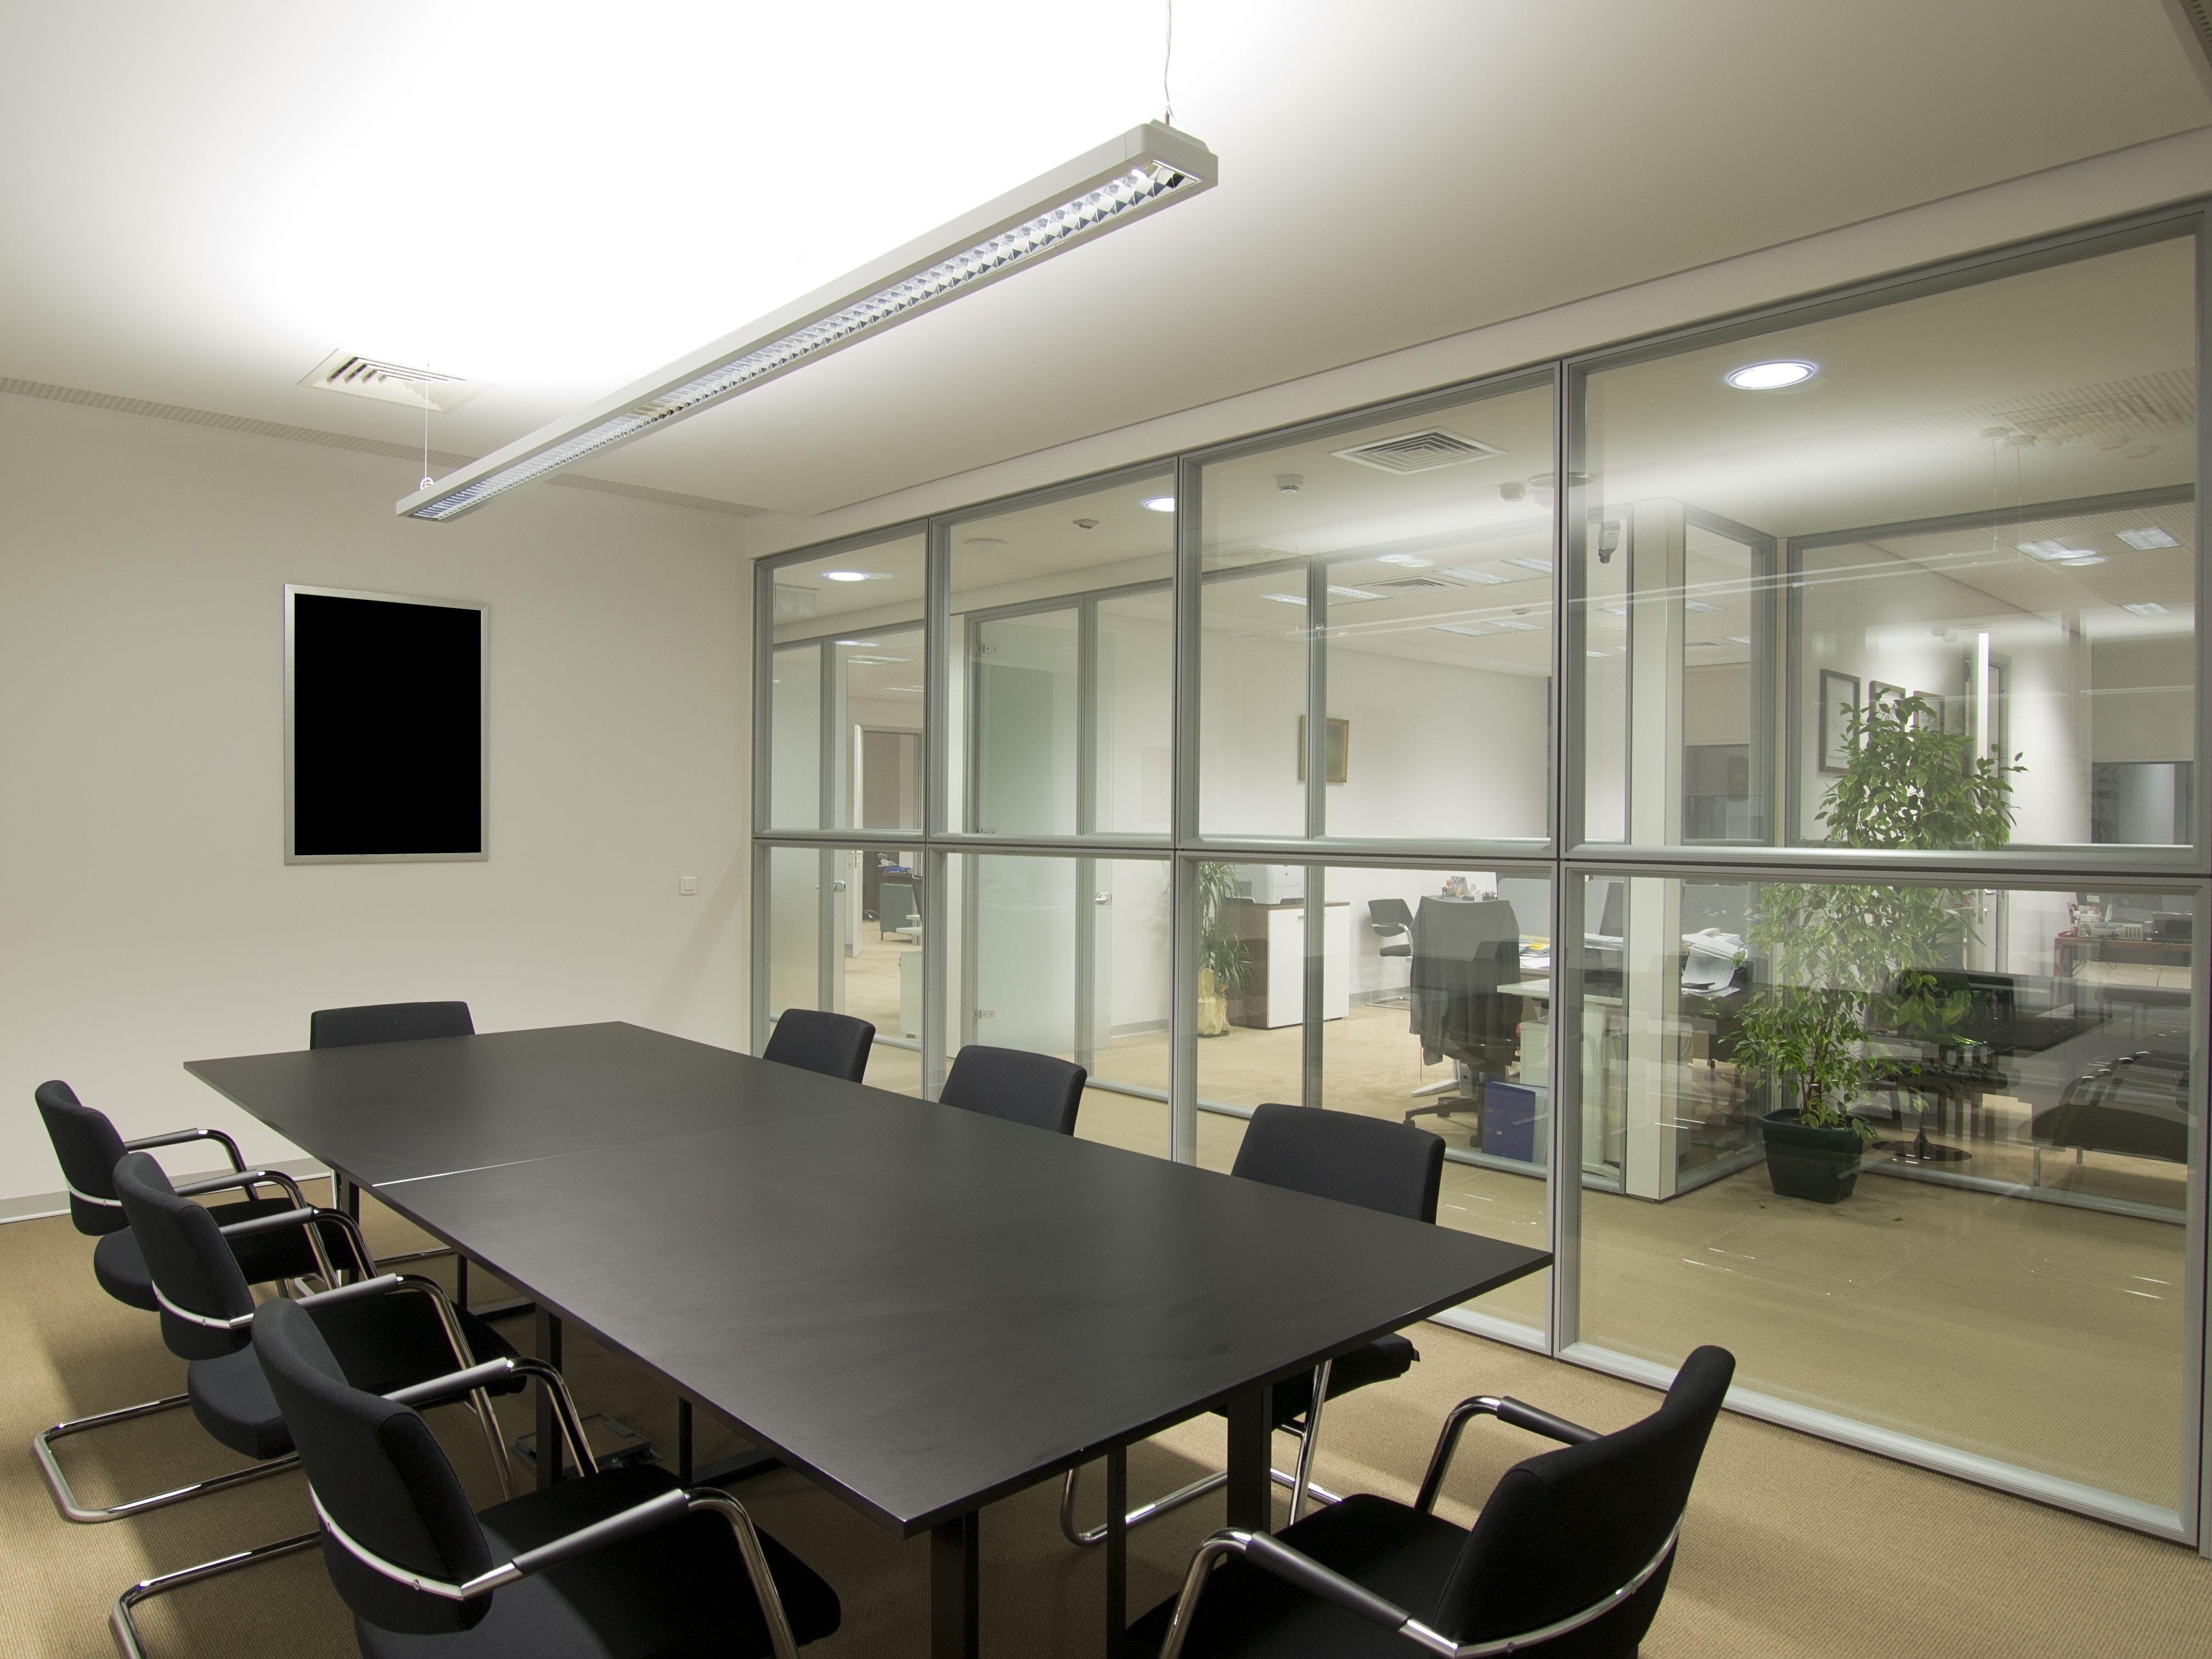 8FT LED Linear Suspension Light LED Office / Conference